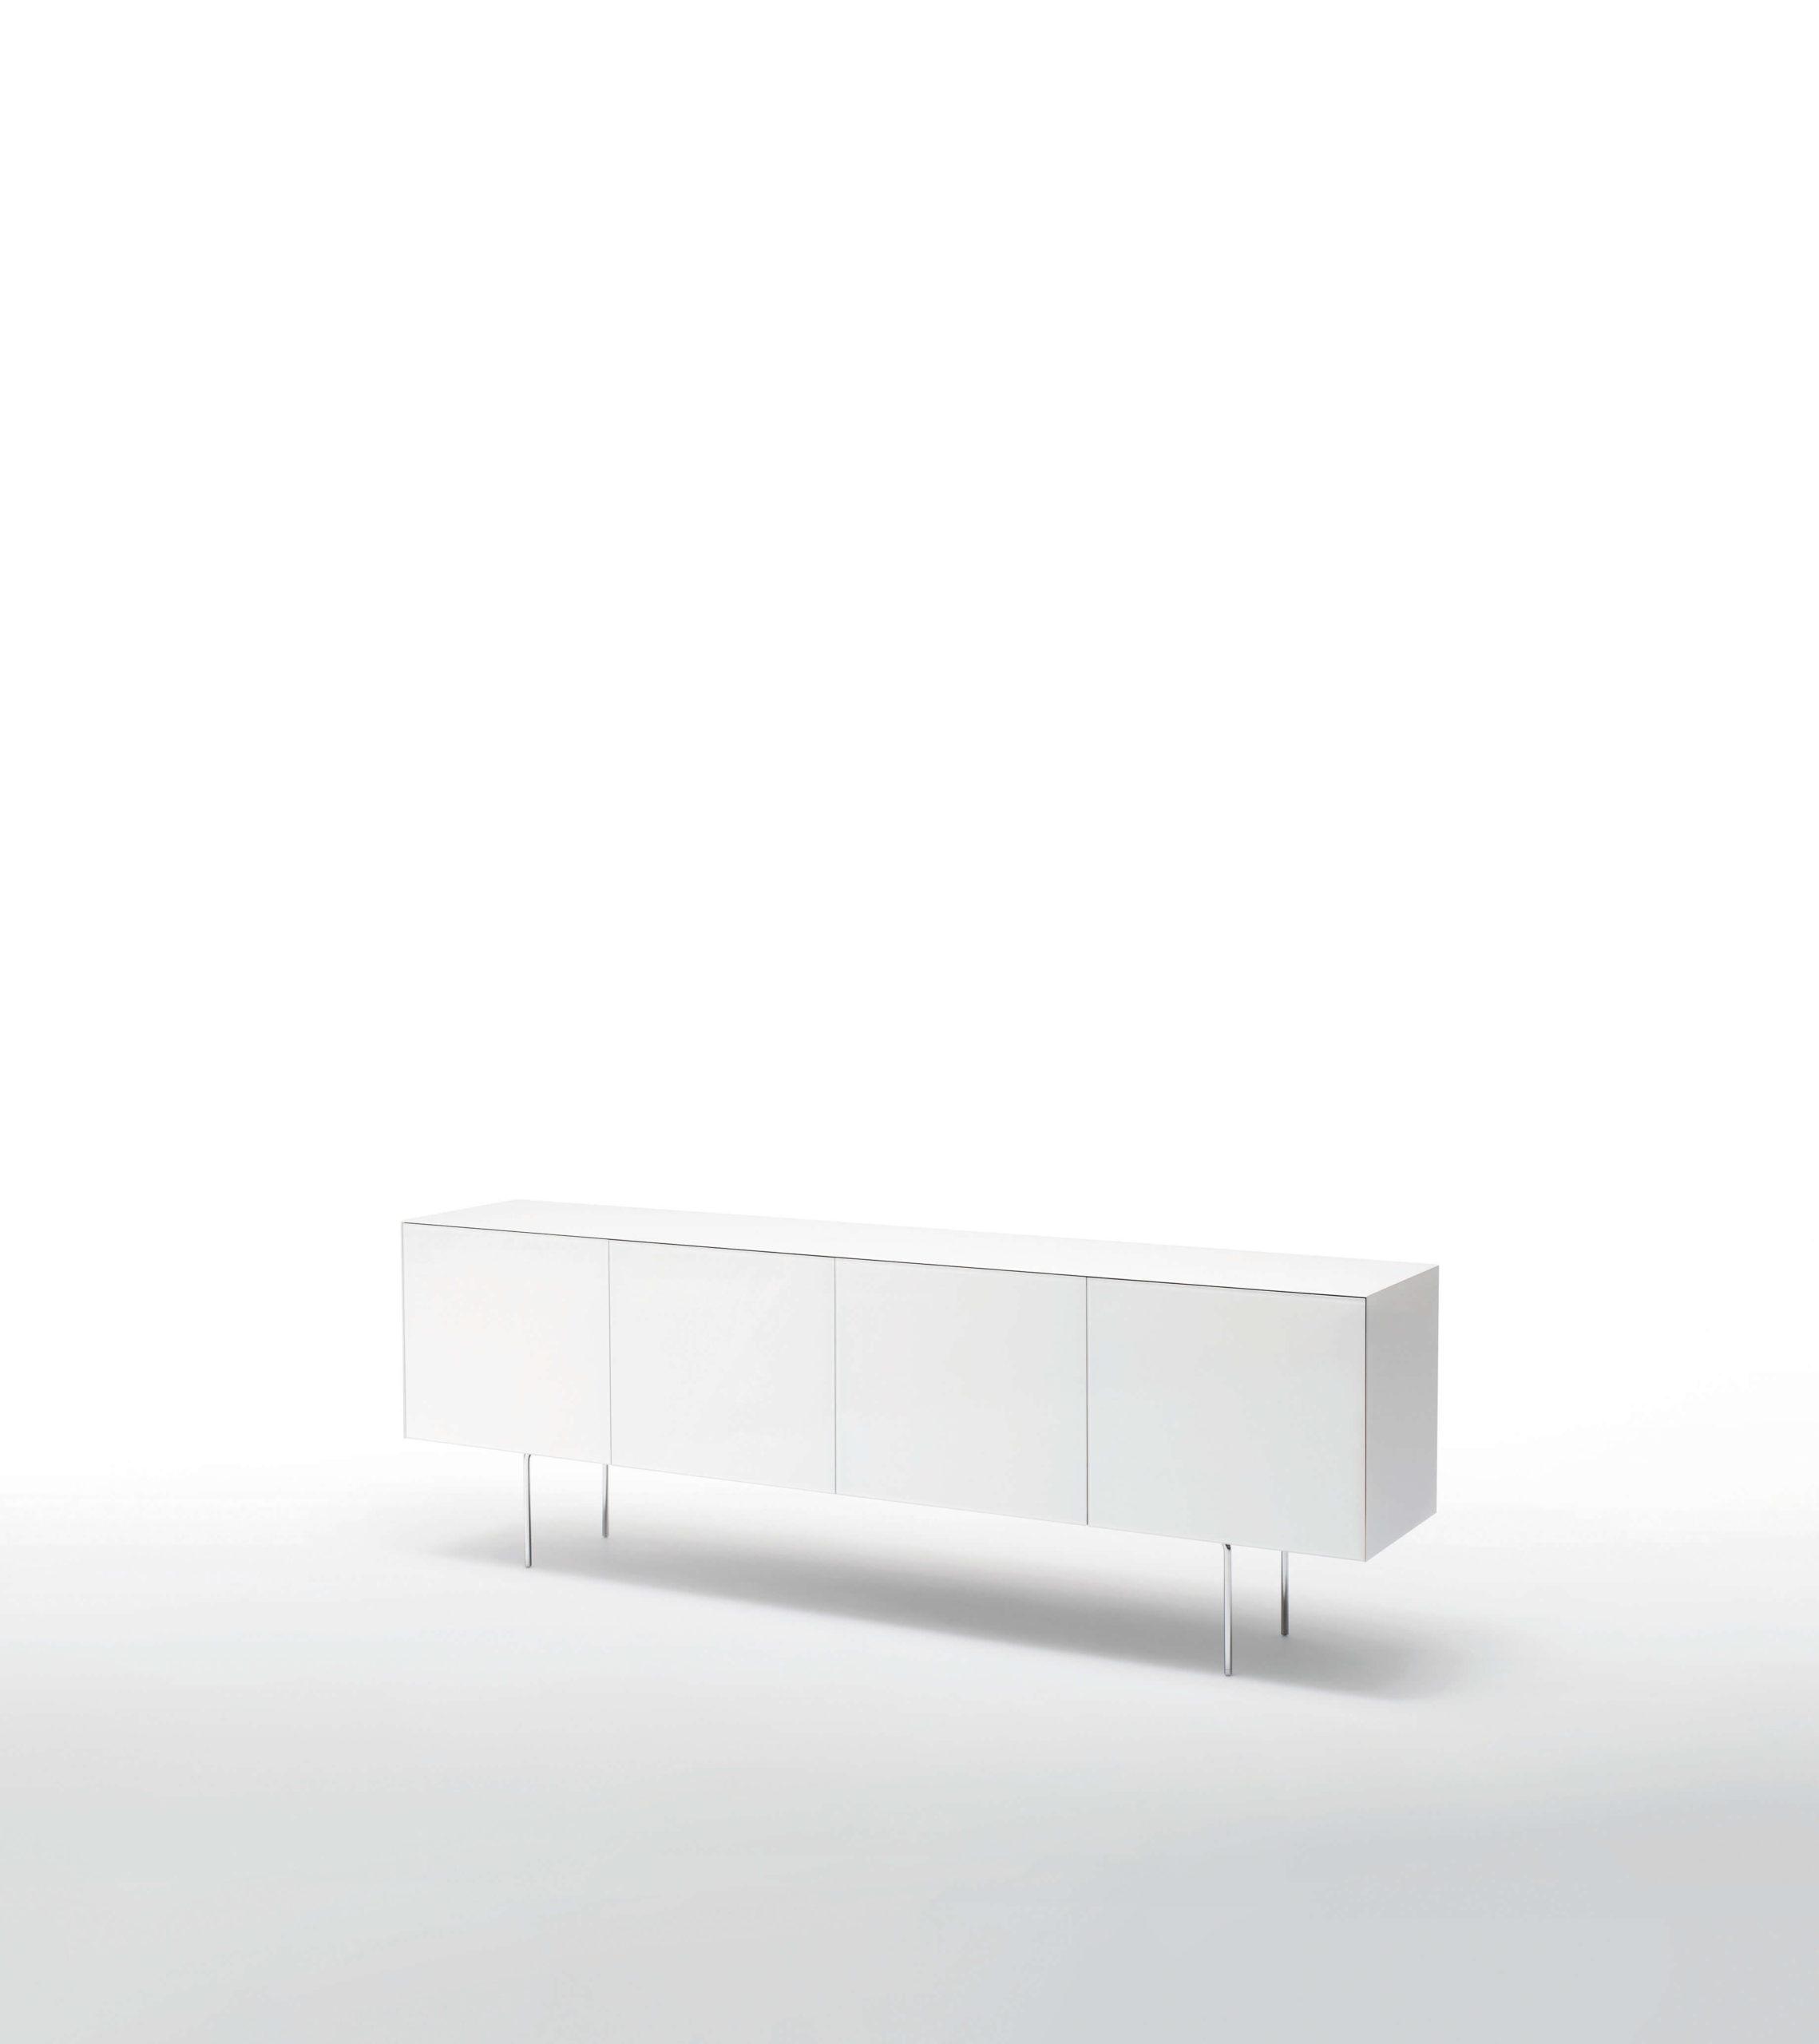 Magic Box, Glas Italia